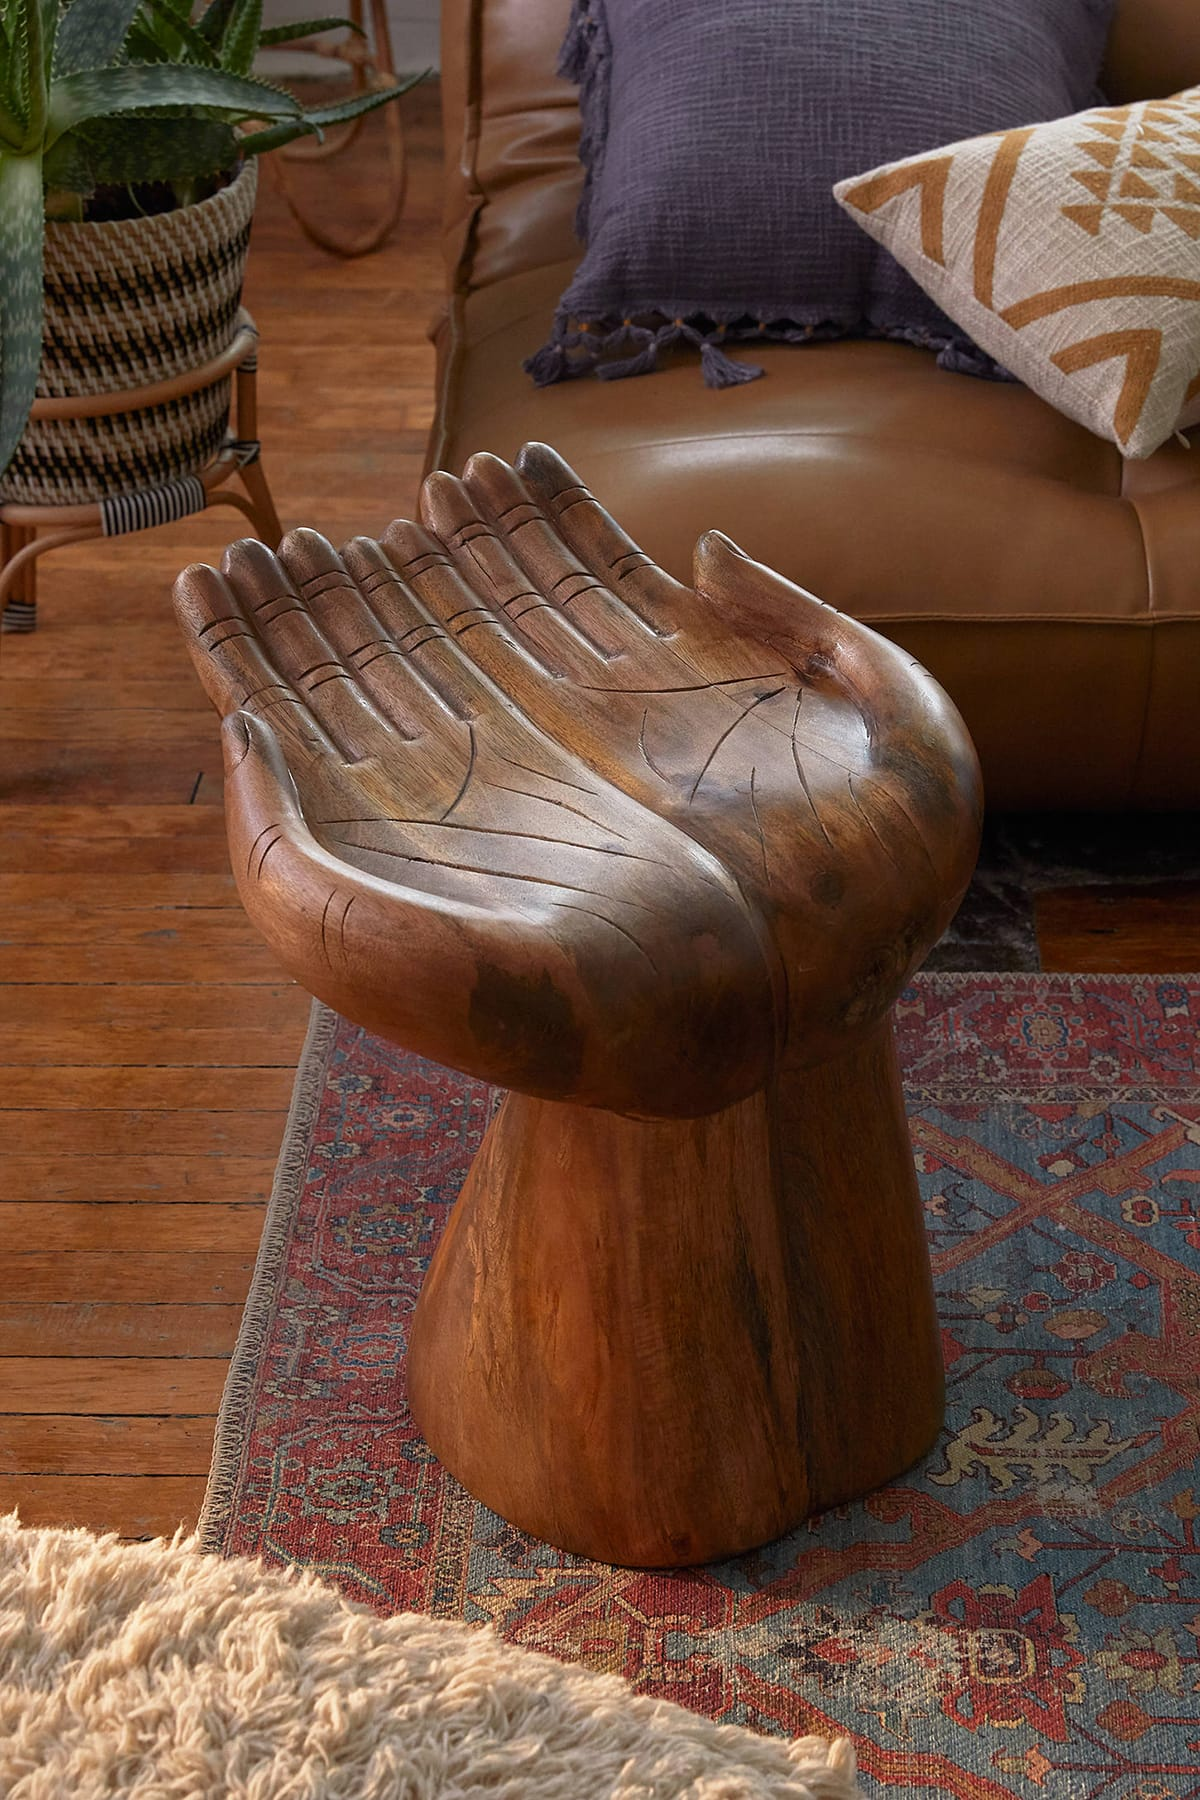 wooden hand stool